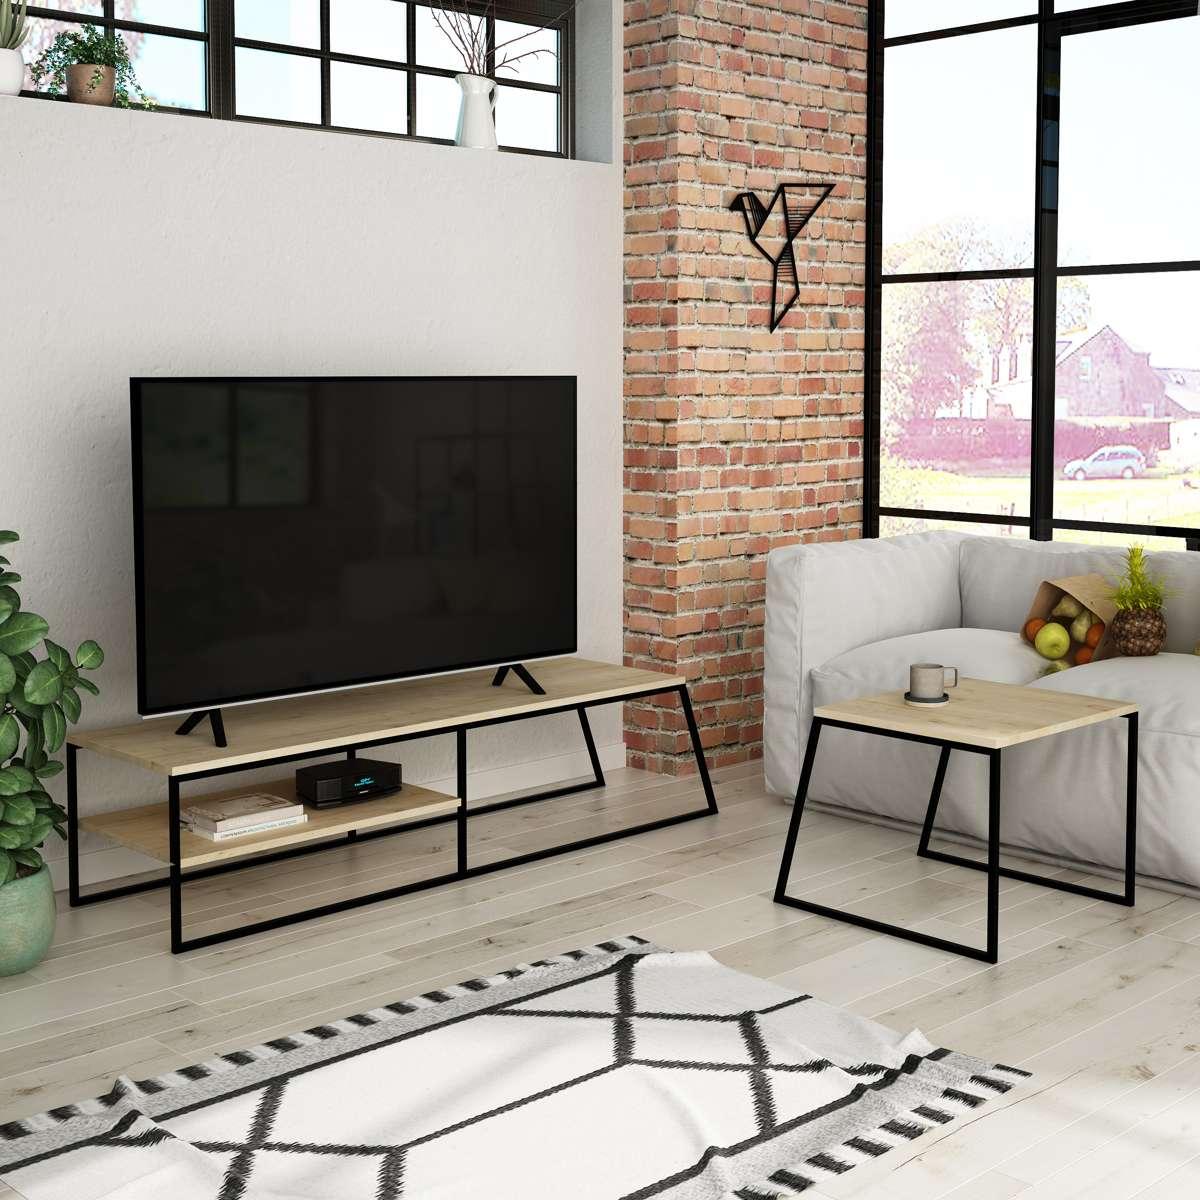 מזנון טלוויזיה  + שולחן סלון PAL TV STAND אלון 163ס